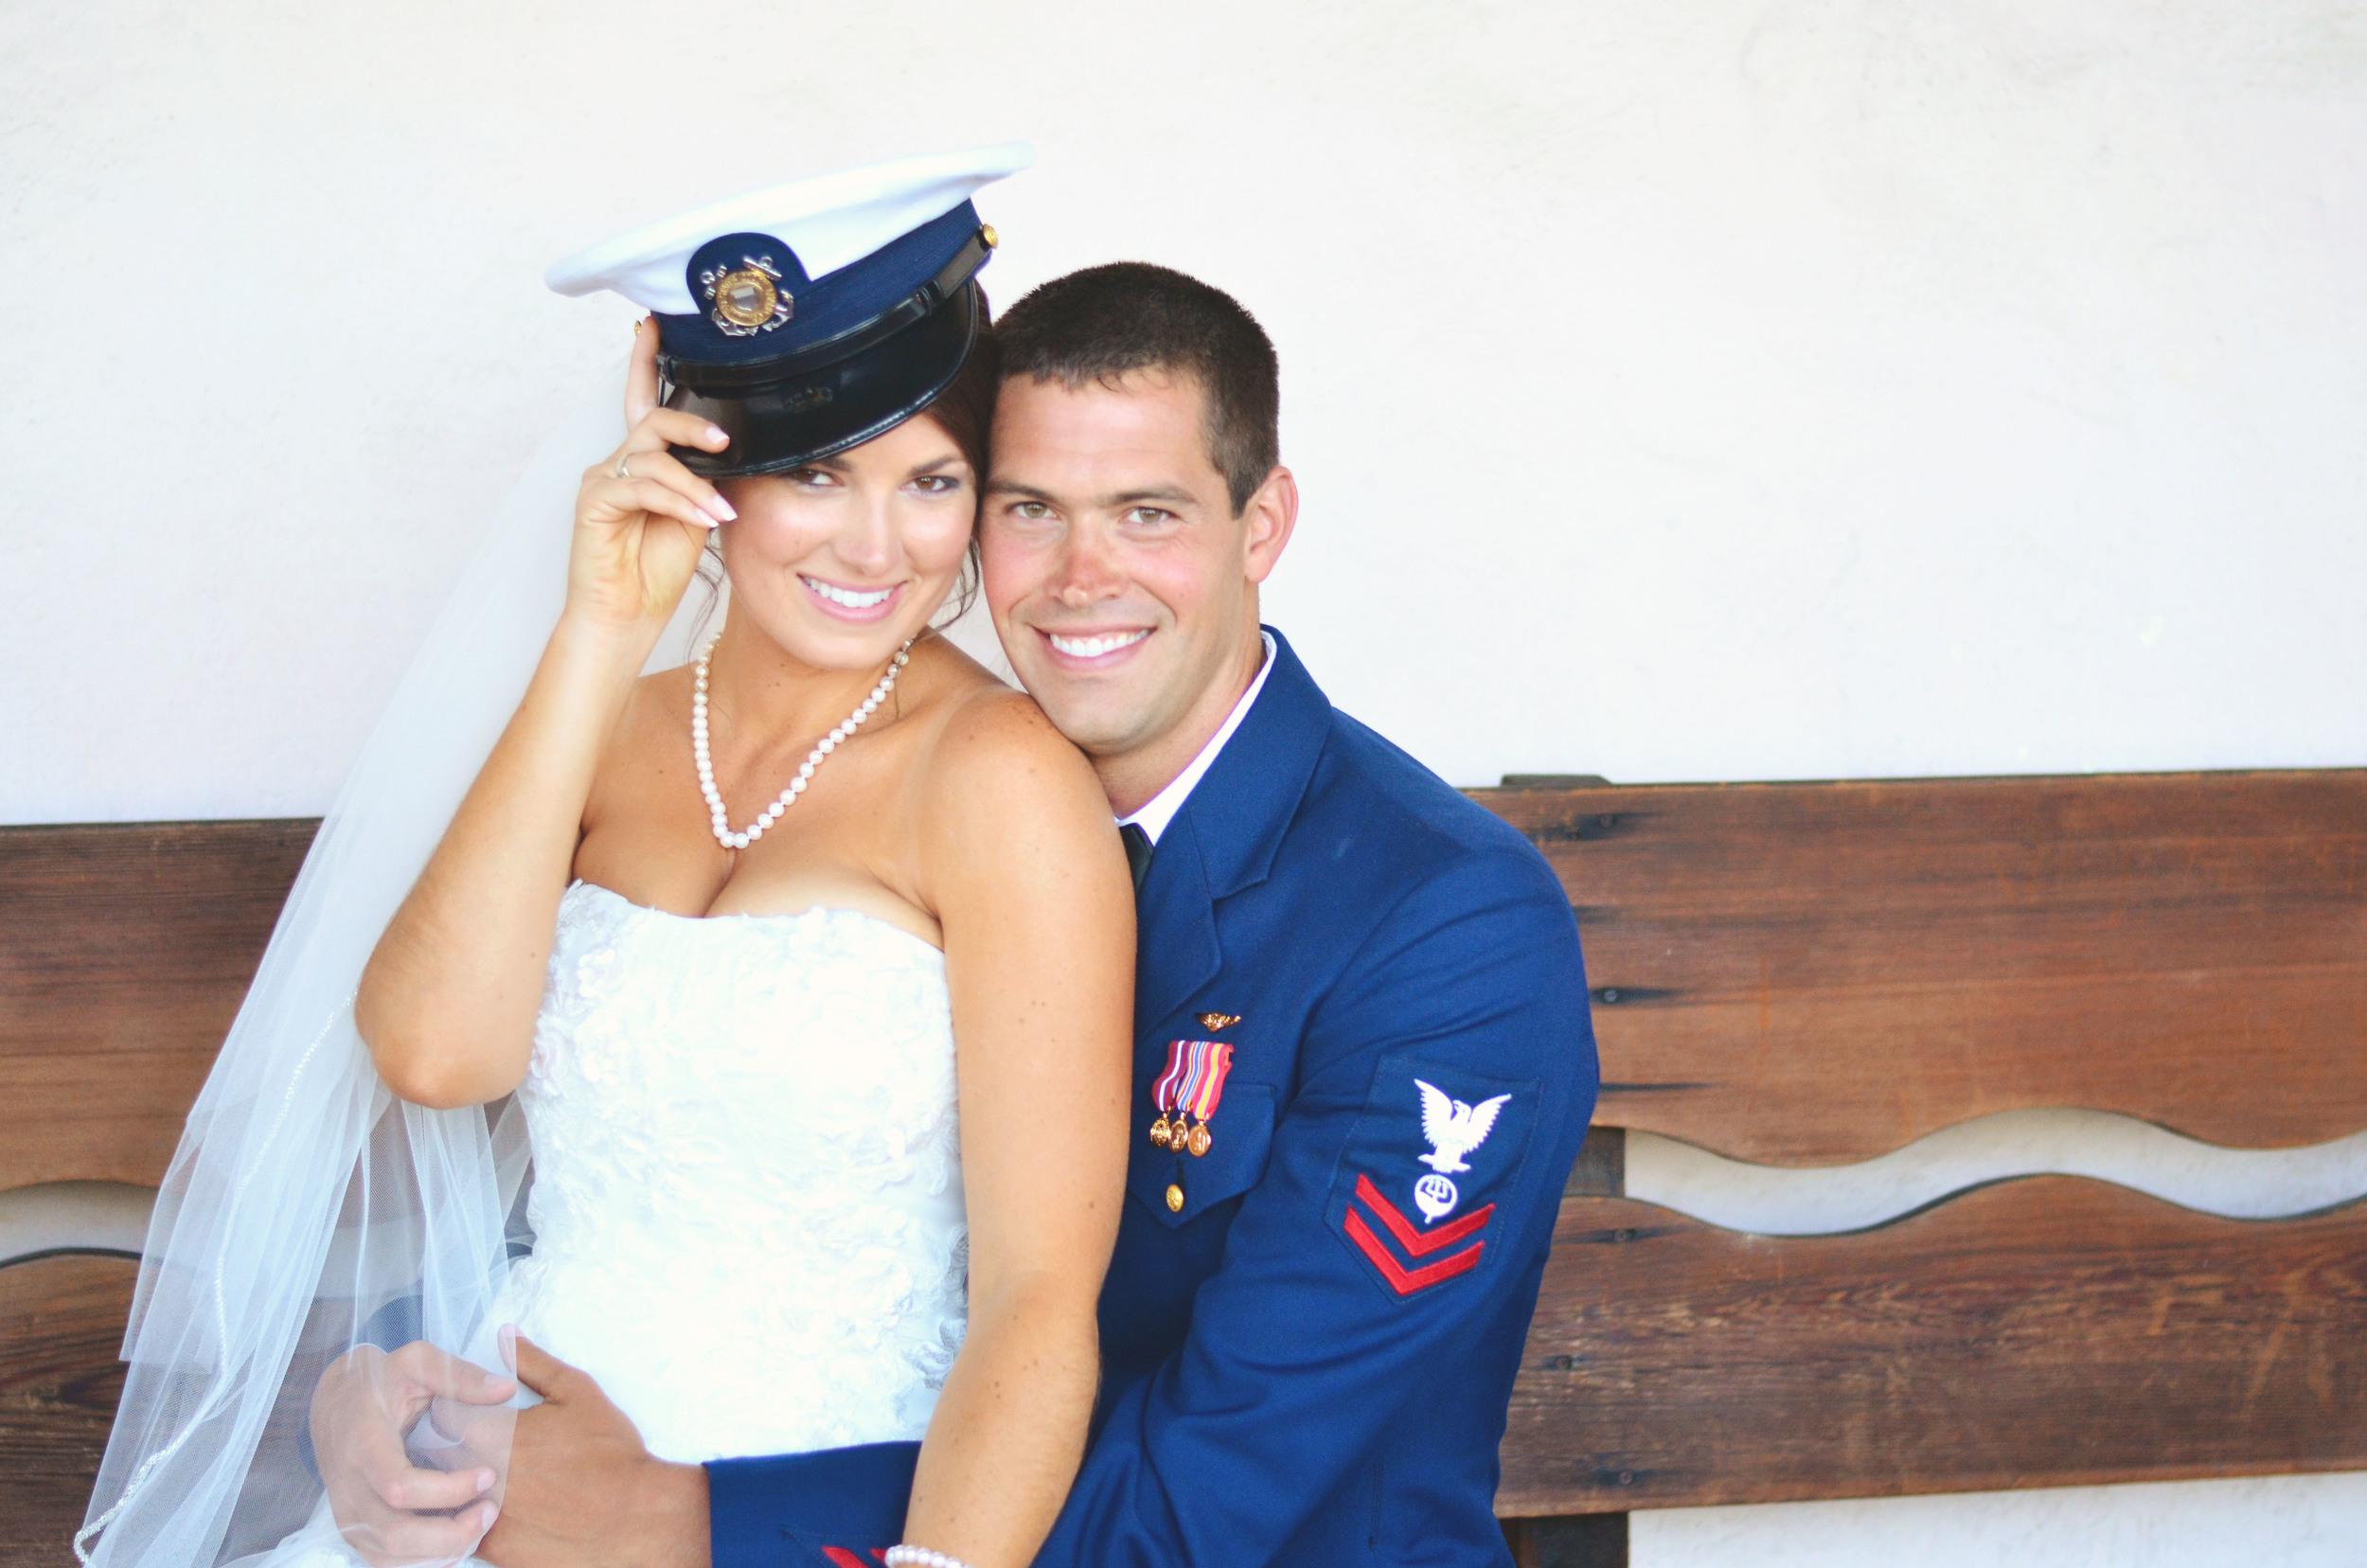 Julie and Alex Wedding 7-29-12_0667 copy 2.jpg